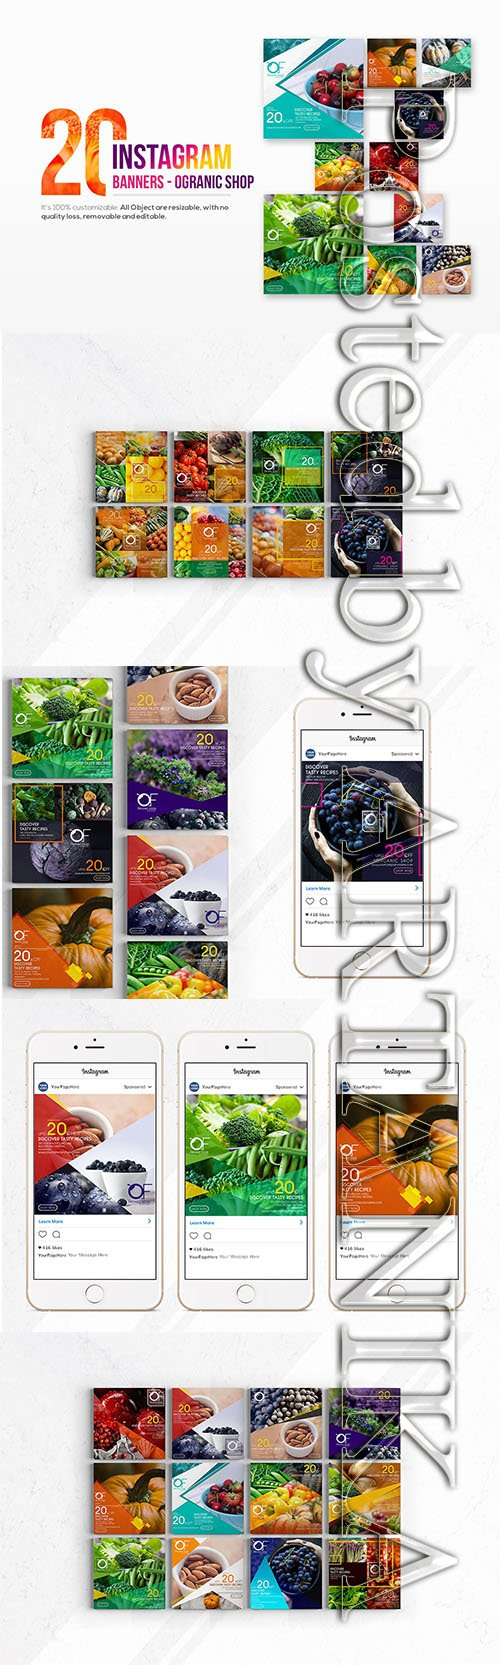 20 Instagram Organic Shop Banners